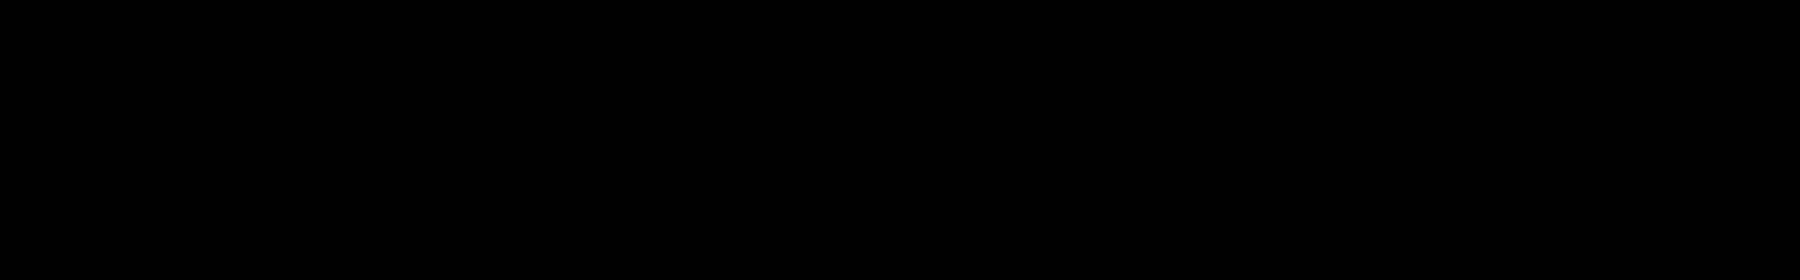 SINEE - DARK ORIGINS audio waveform